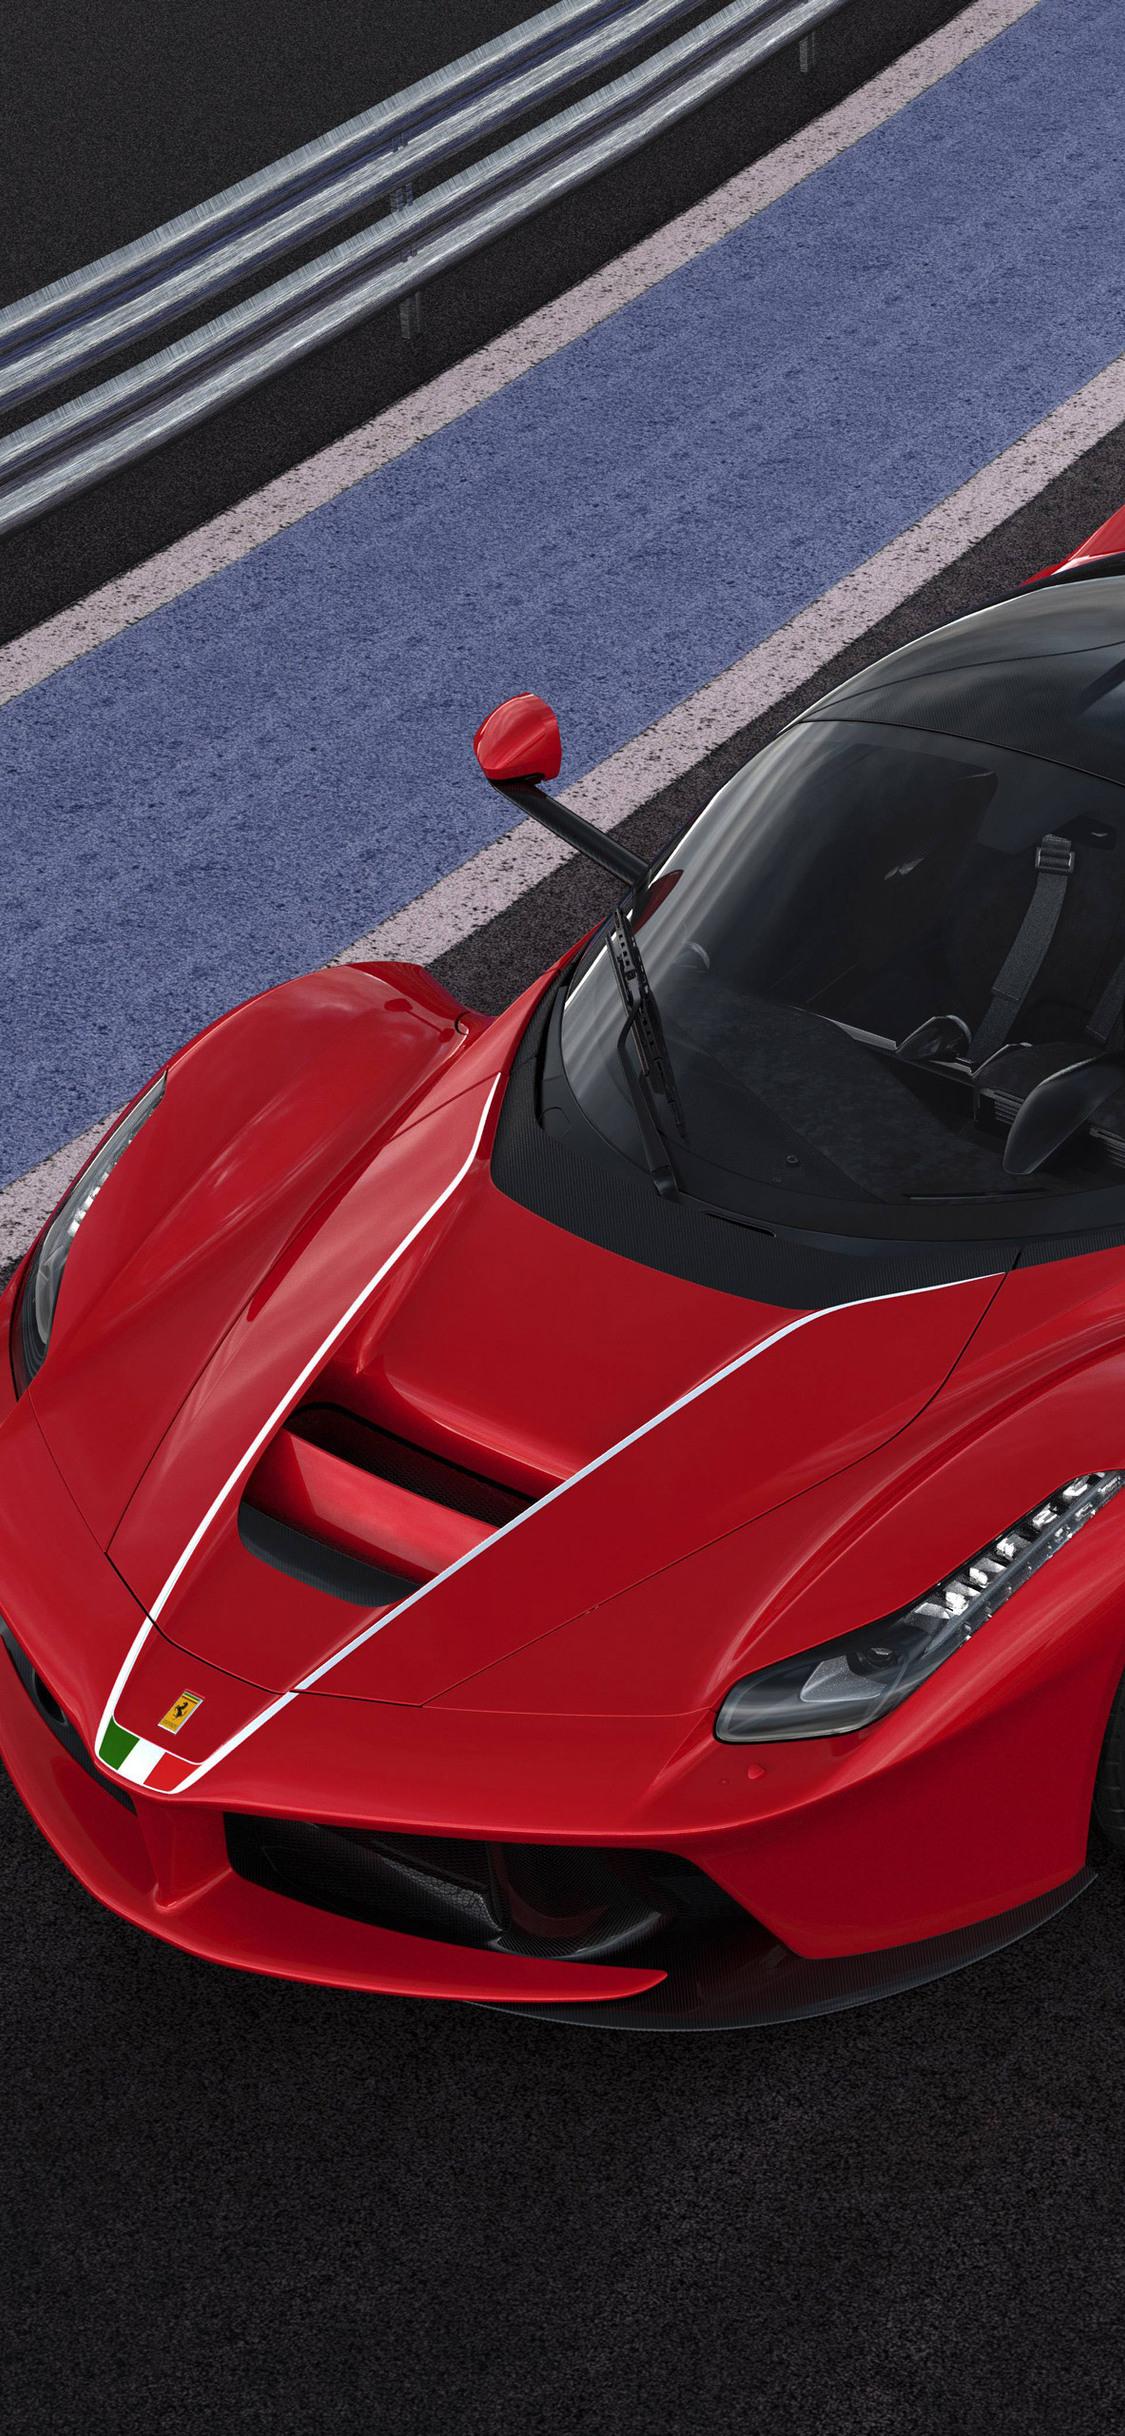 1125x2436 La Ferrari 8k Iphone XS,Iphone 10,Iphone X HD 4k ...